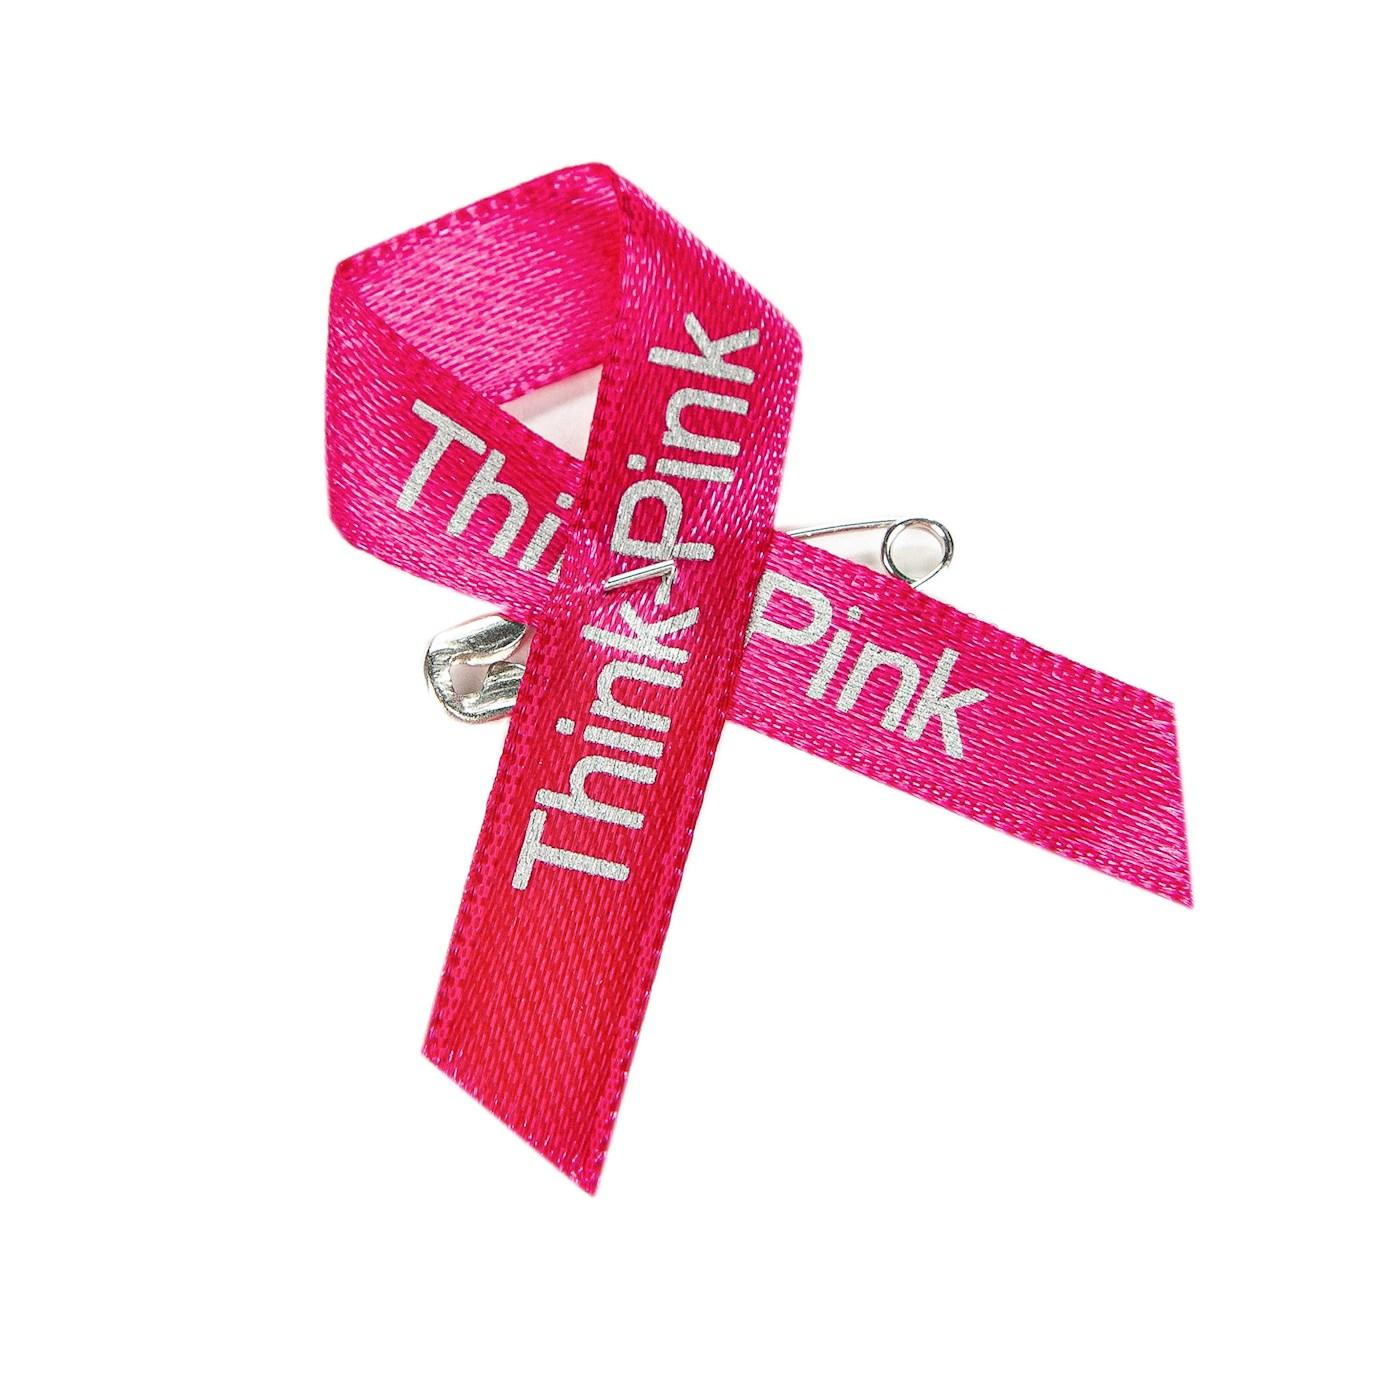 think-pink_0.jpg